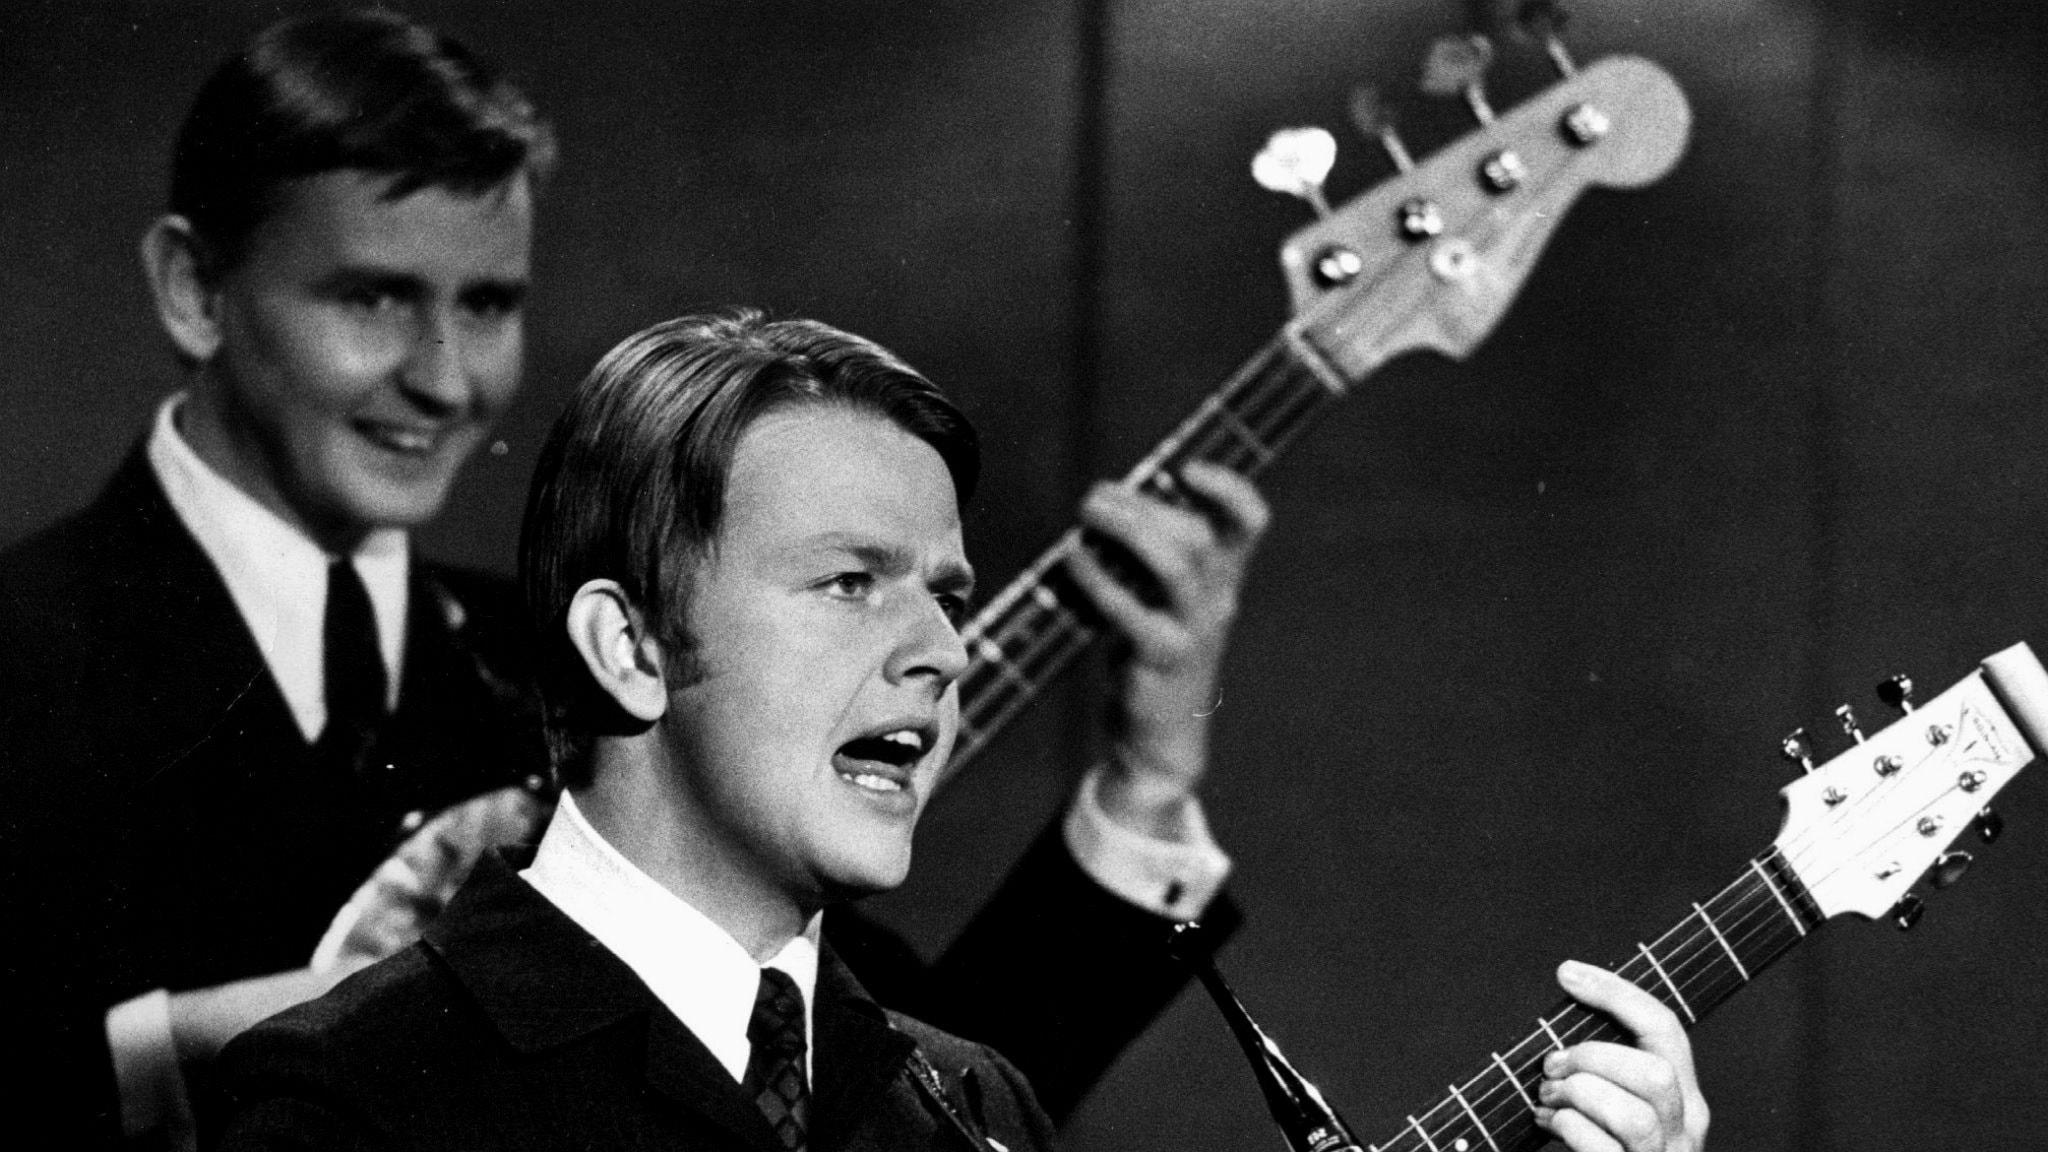 Ligger Sven-Ingvars kvar i topp på Svensktoppen från 20 november 1966?